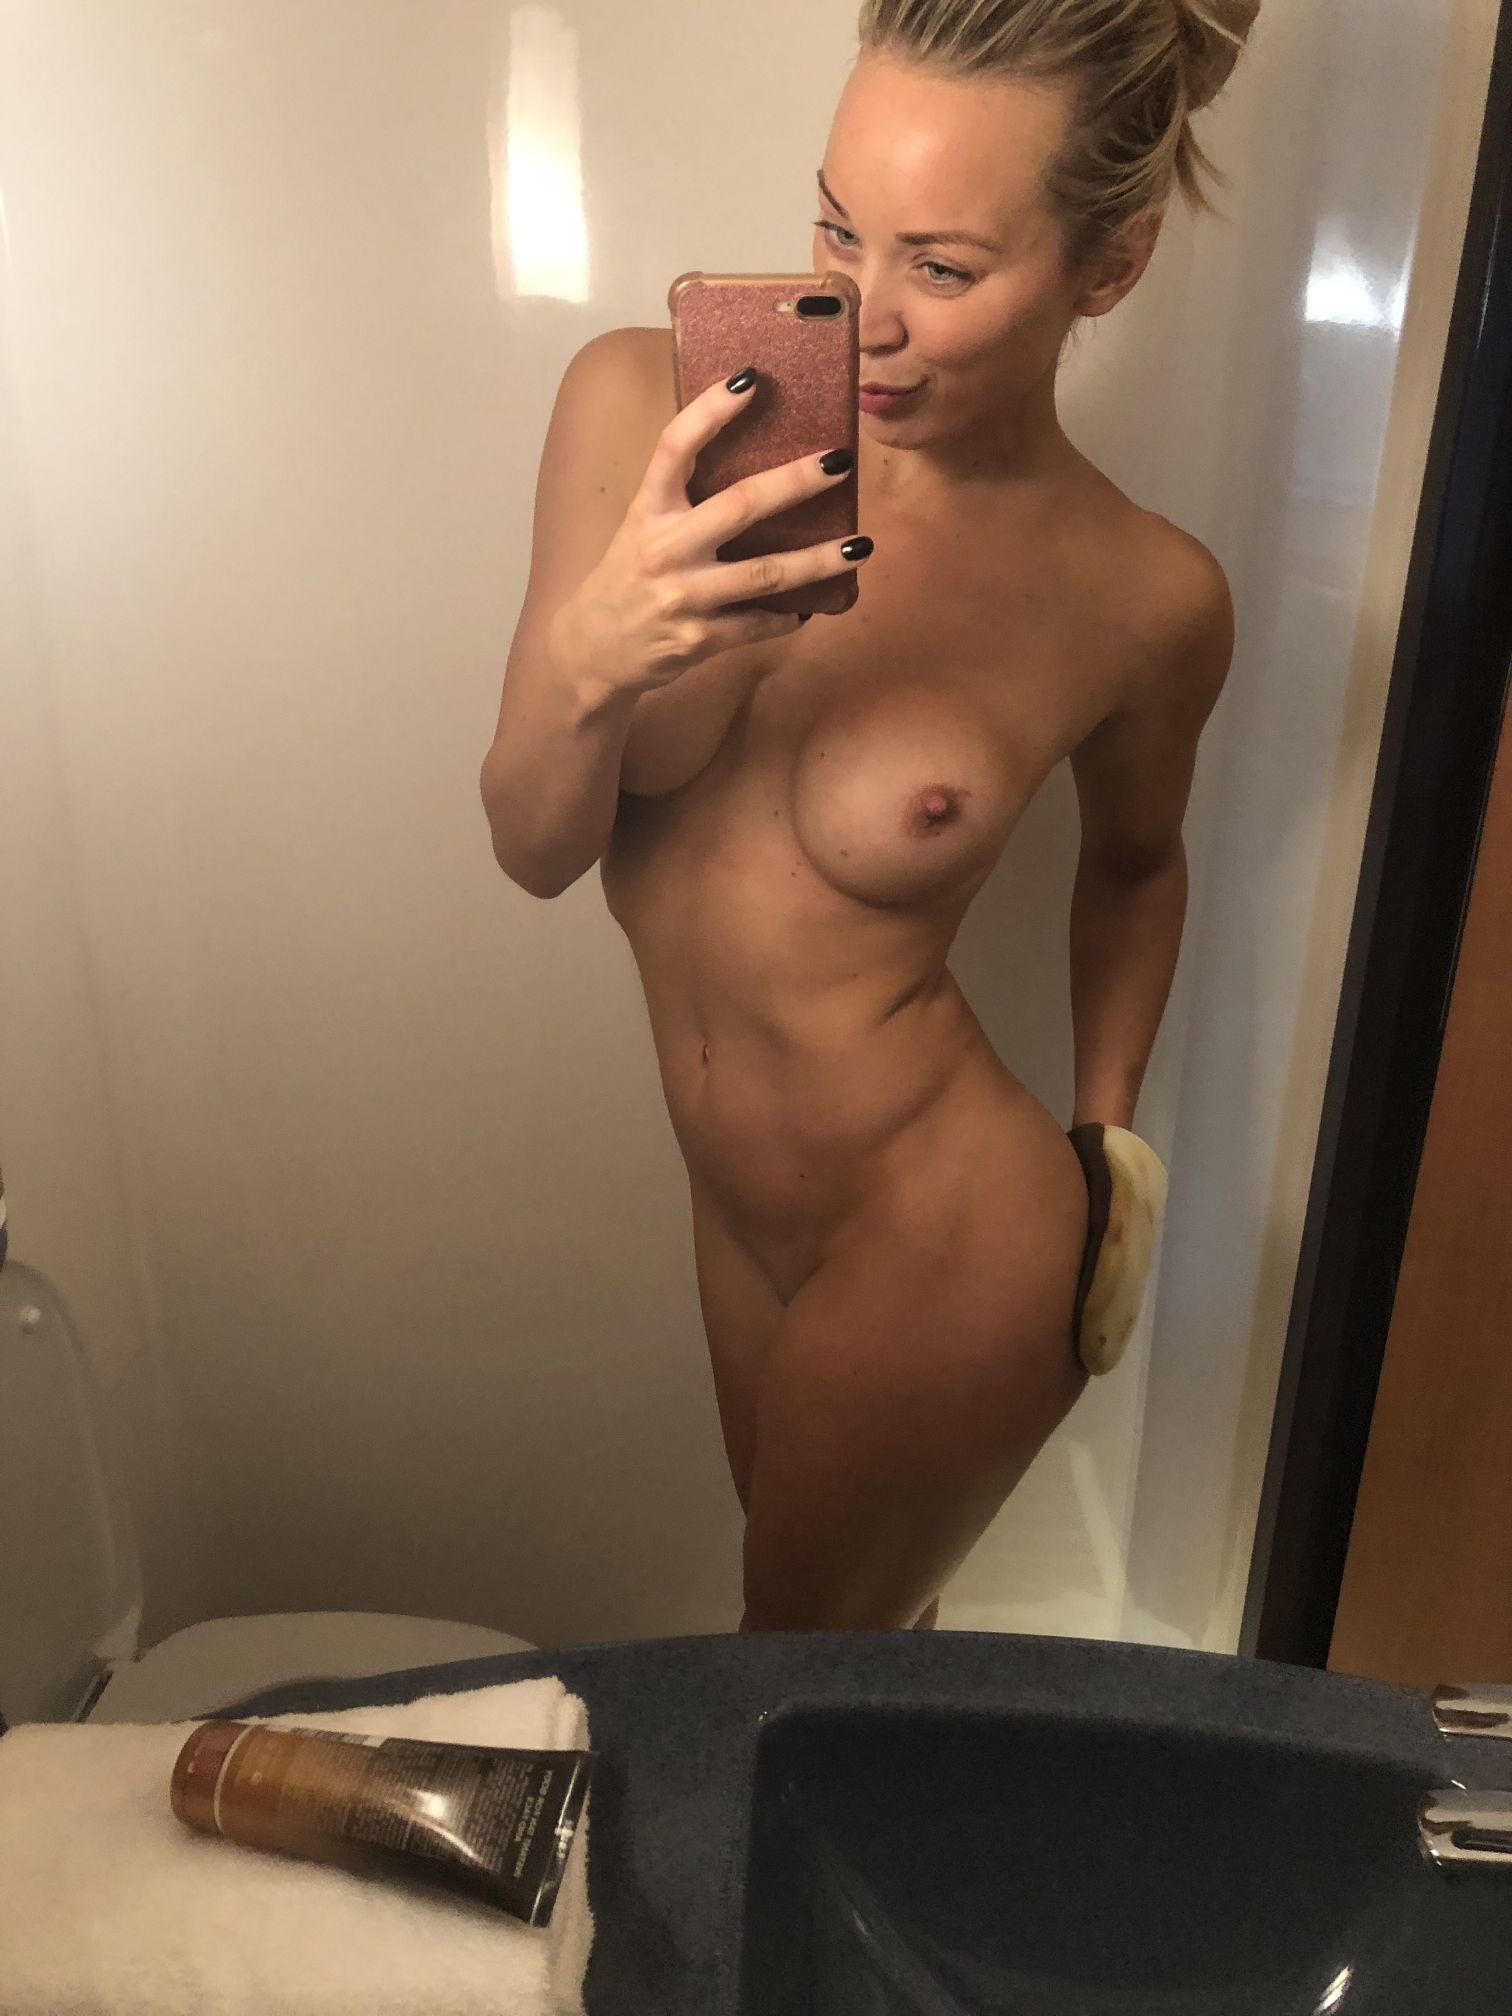 Gabriella abutbol desnudo se filtró